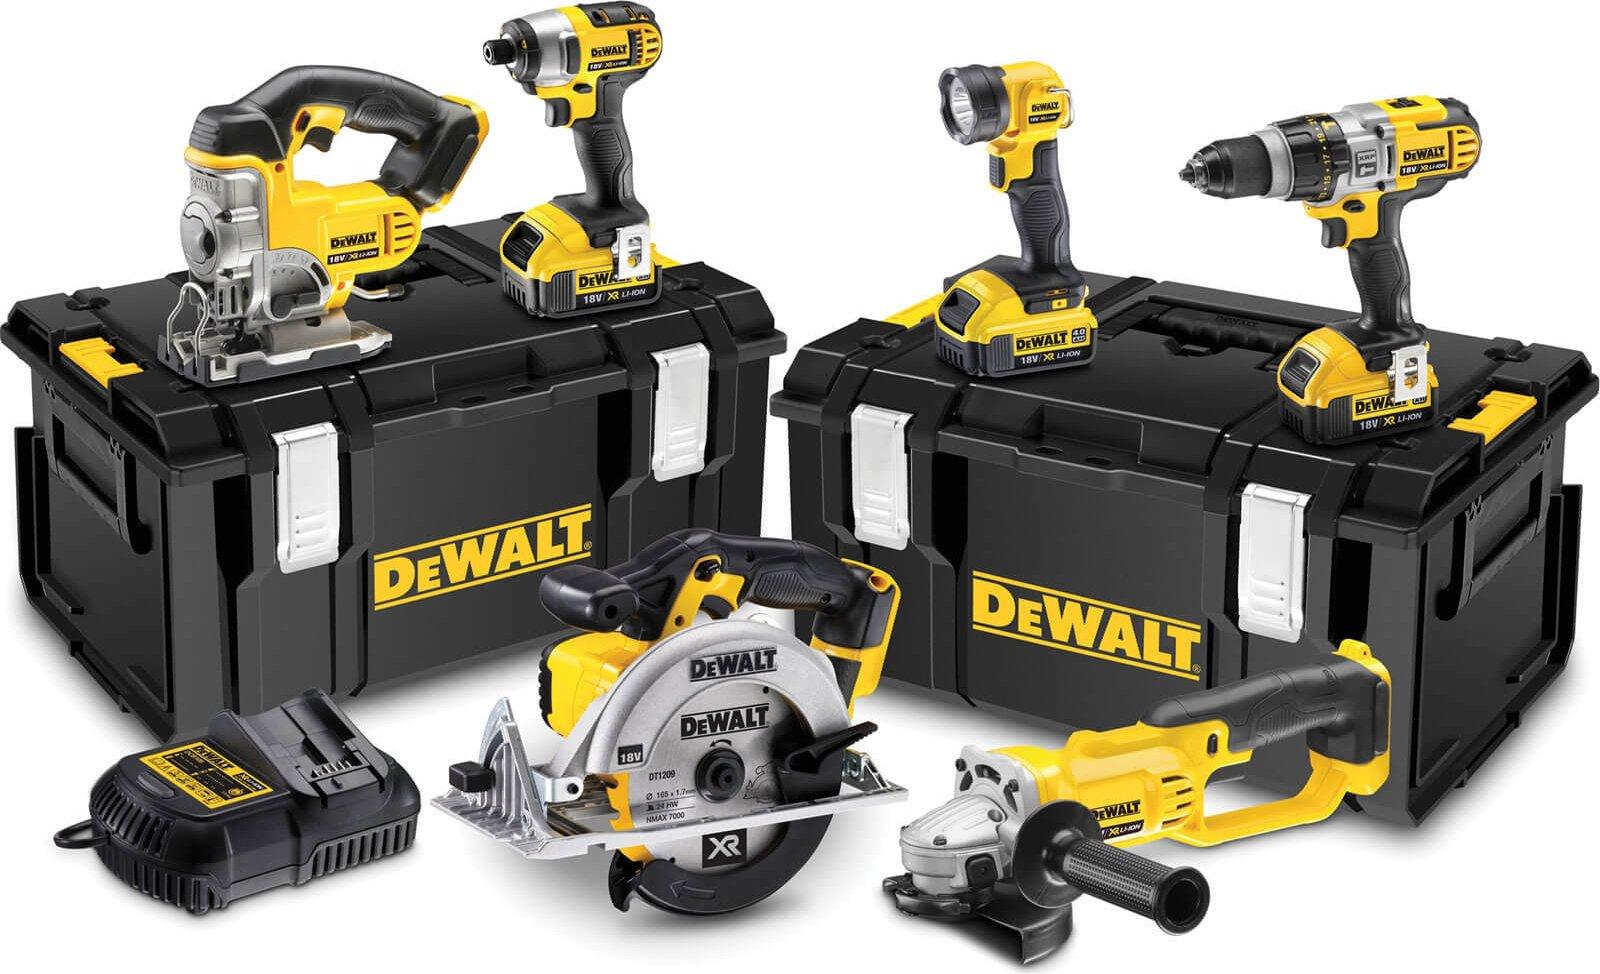 DeWalt DCK692M3 18v XR Cordless 6 Piece Power Tool Kit 3 x 4ah Li ion Charger Case